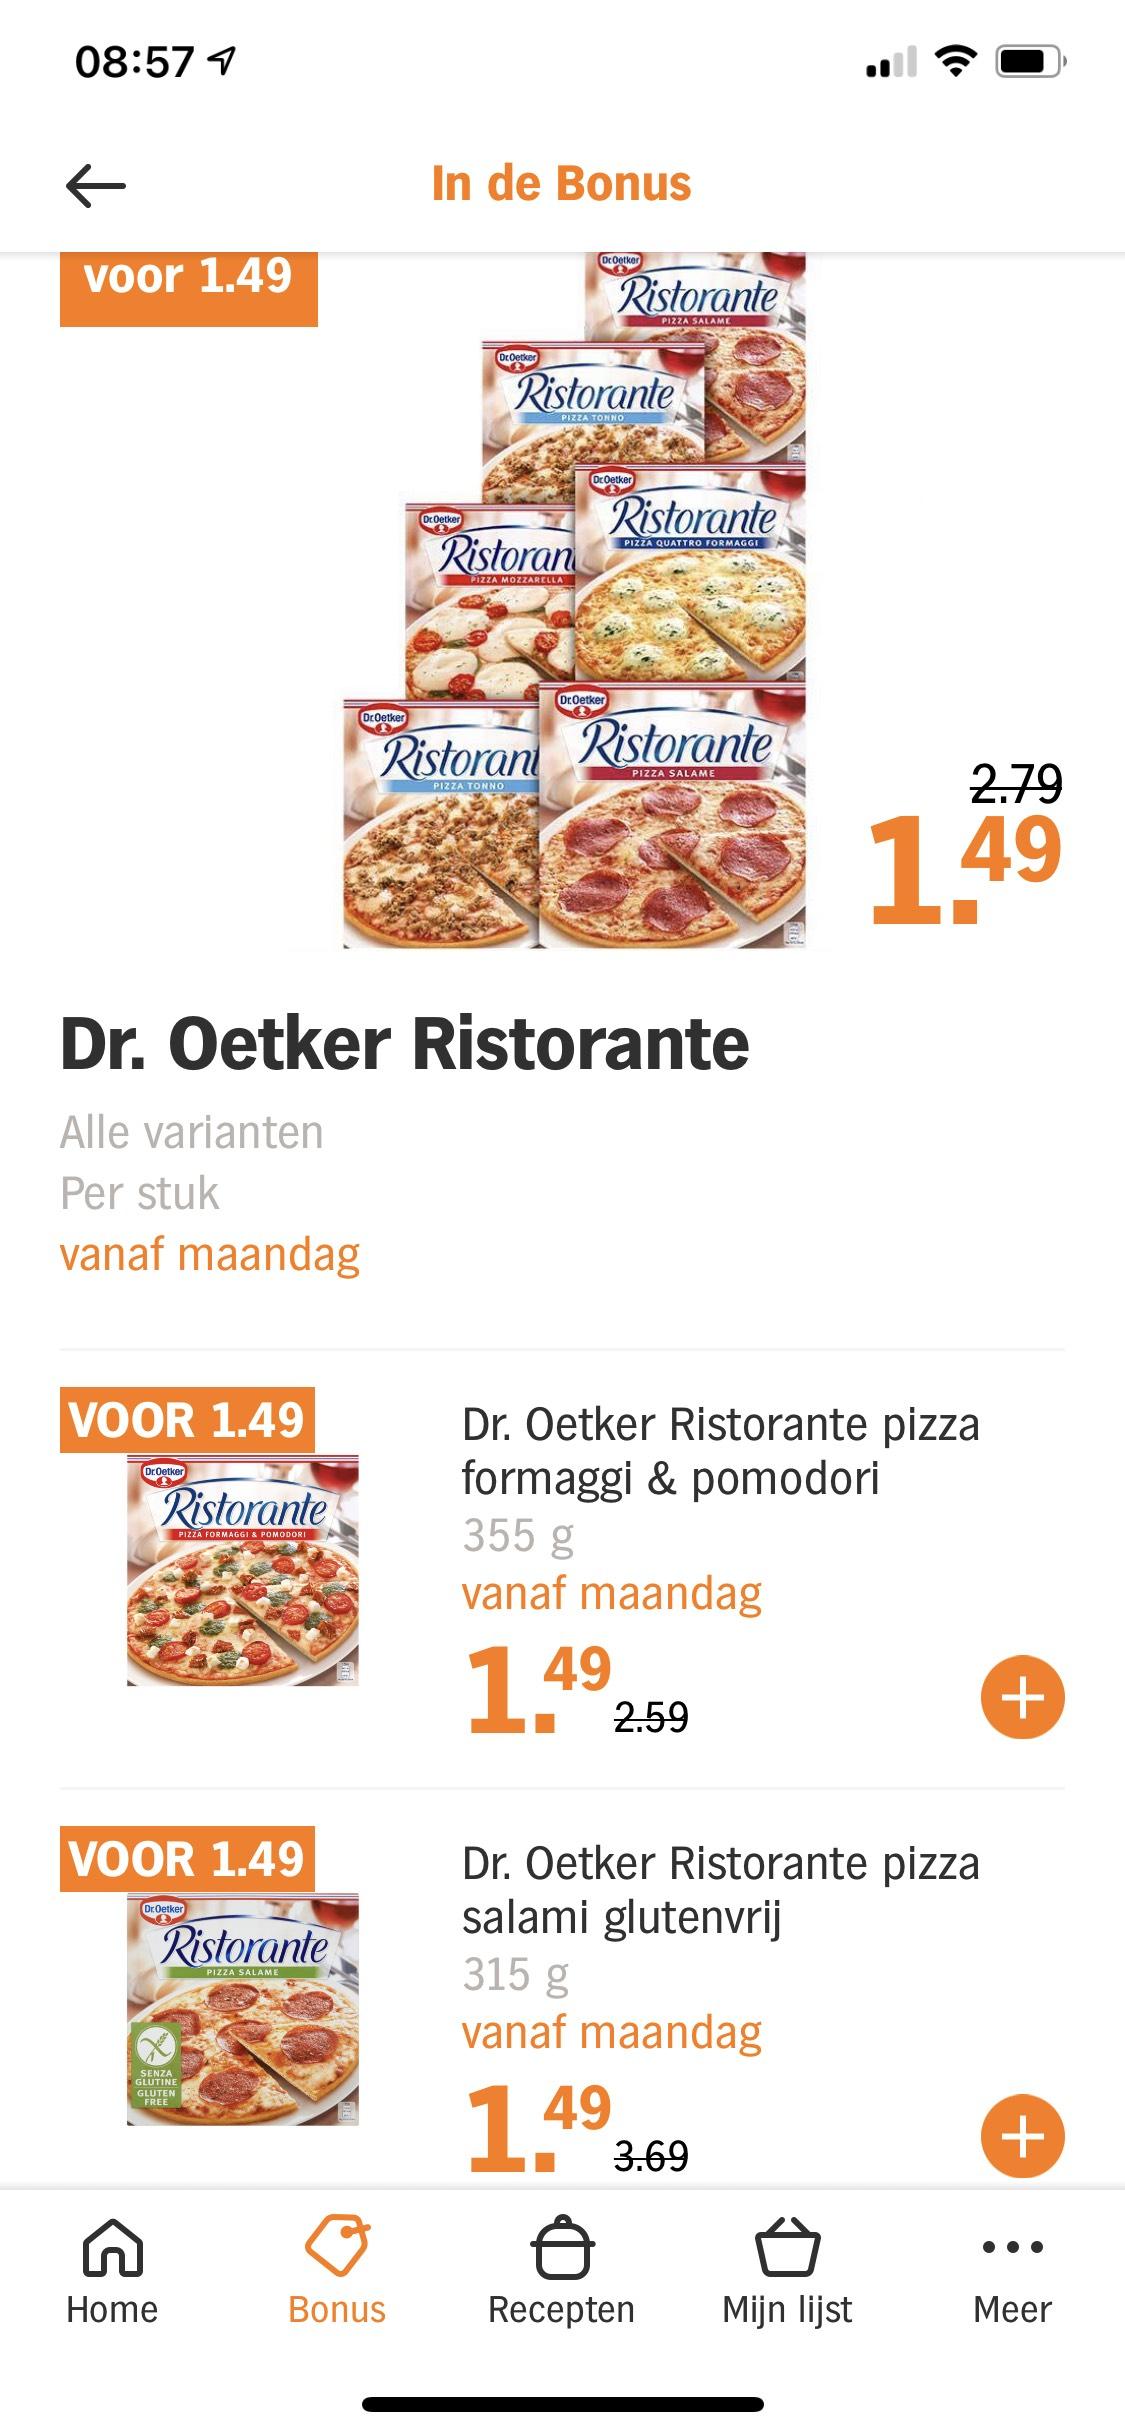 AH: Dr. Oetker Ristorante 1,49€ per stuk ook glutenvrij!